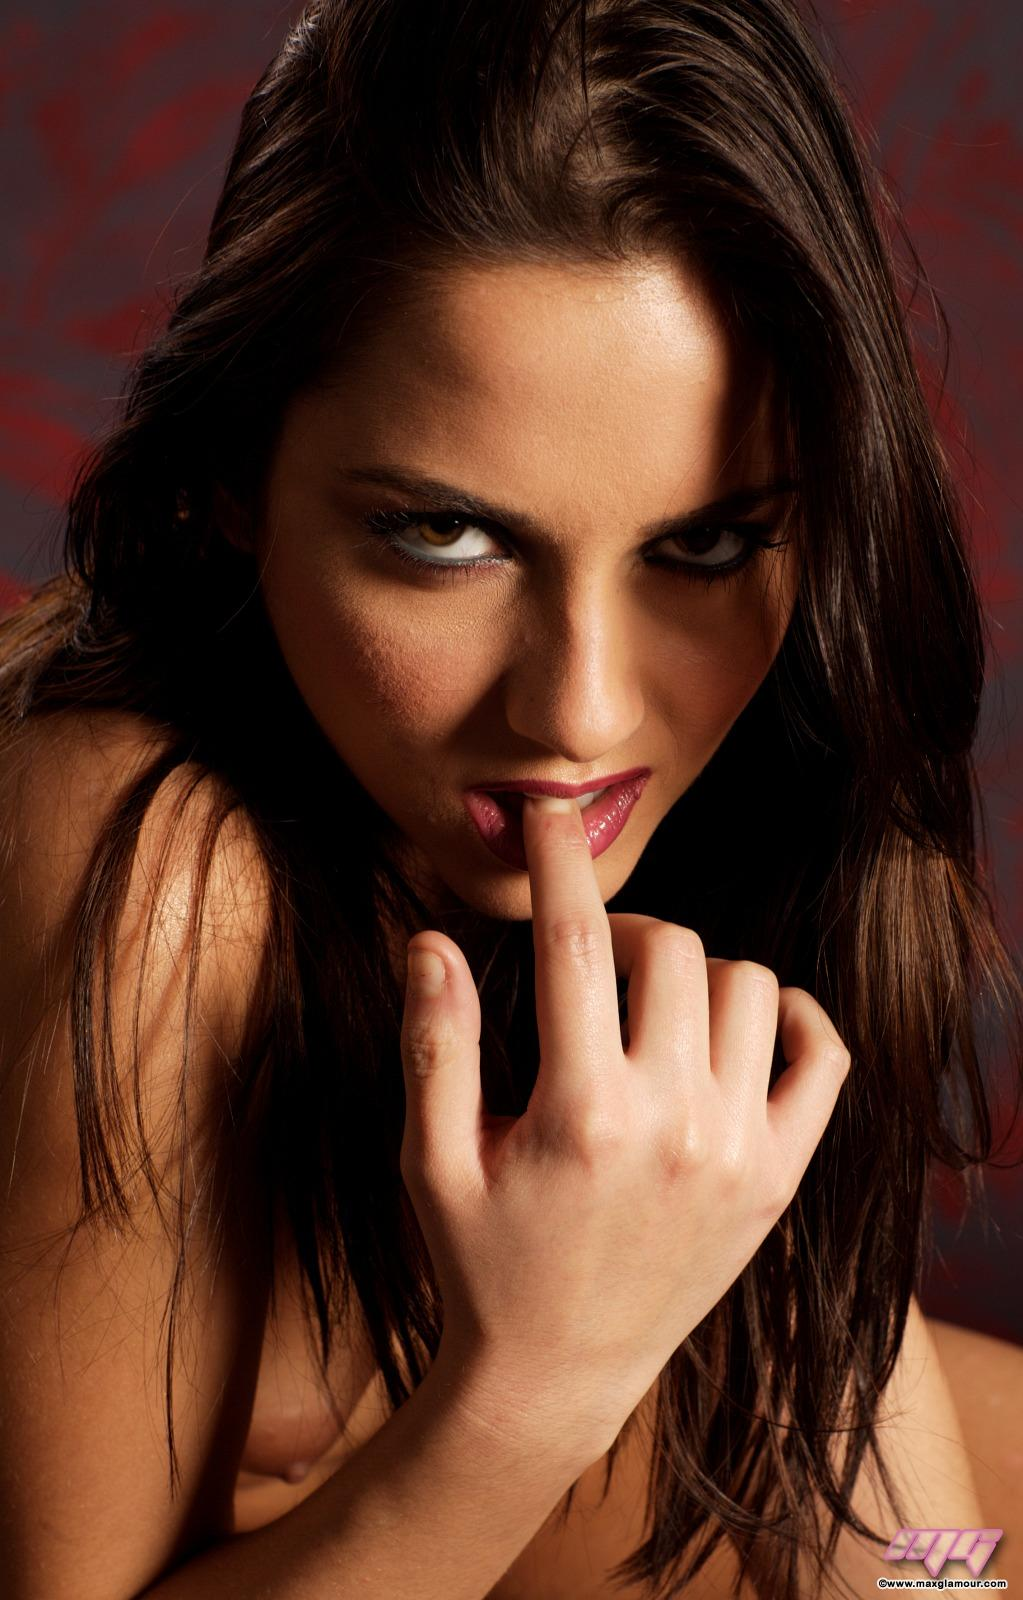 naked xxx dp for hot women